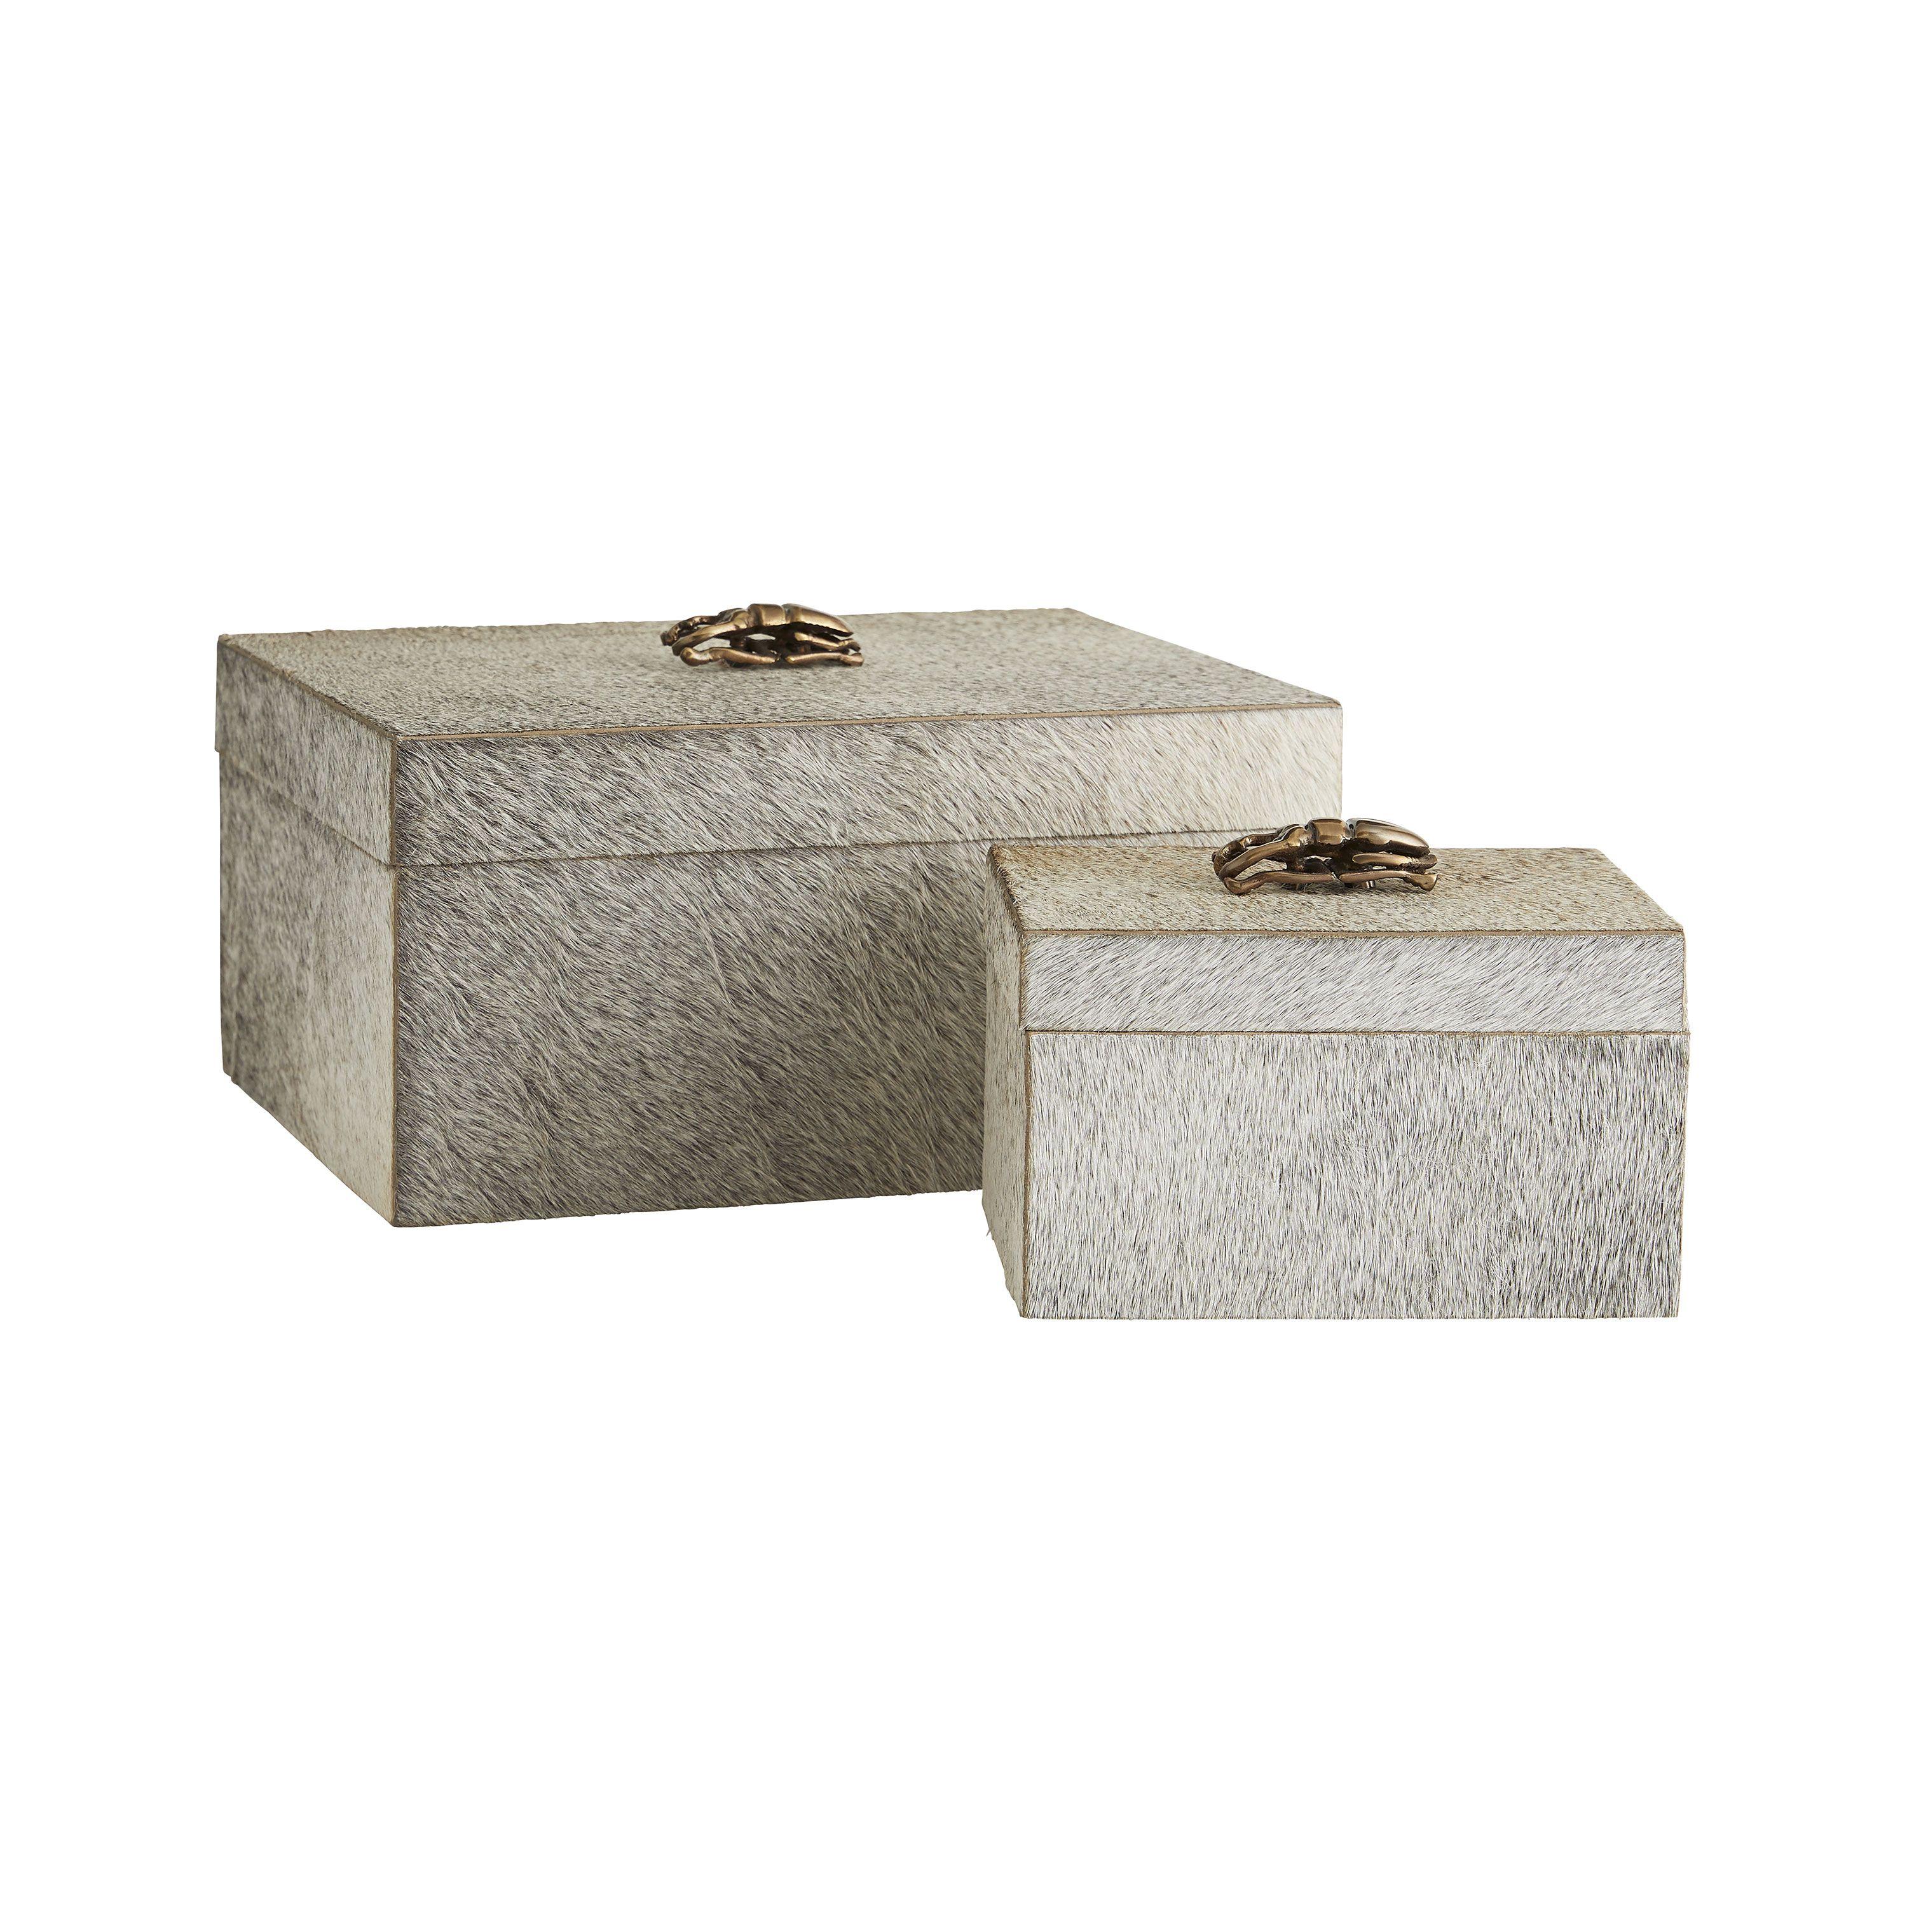 Lola Rectangular Boxes, Set of 2